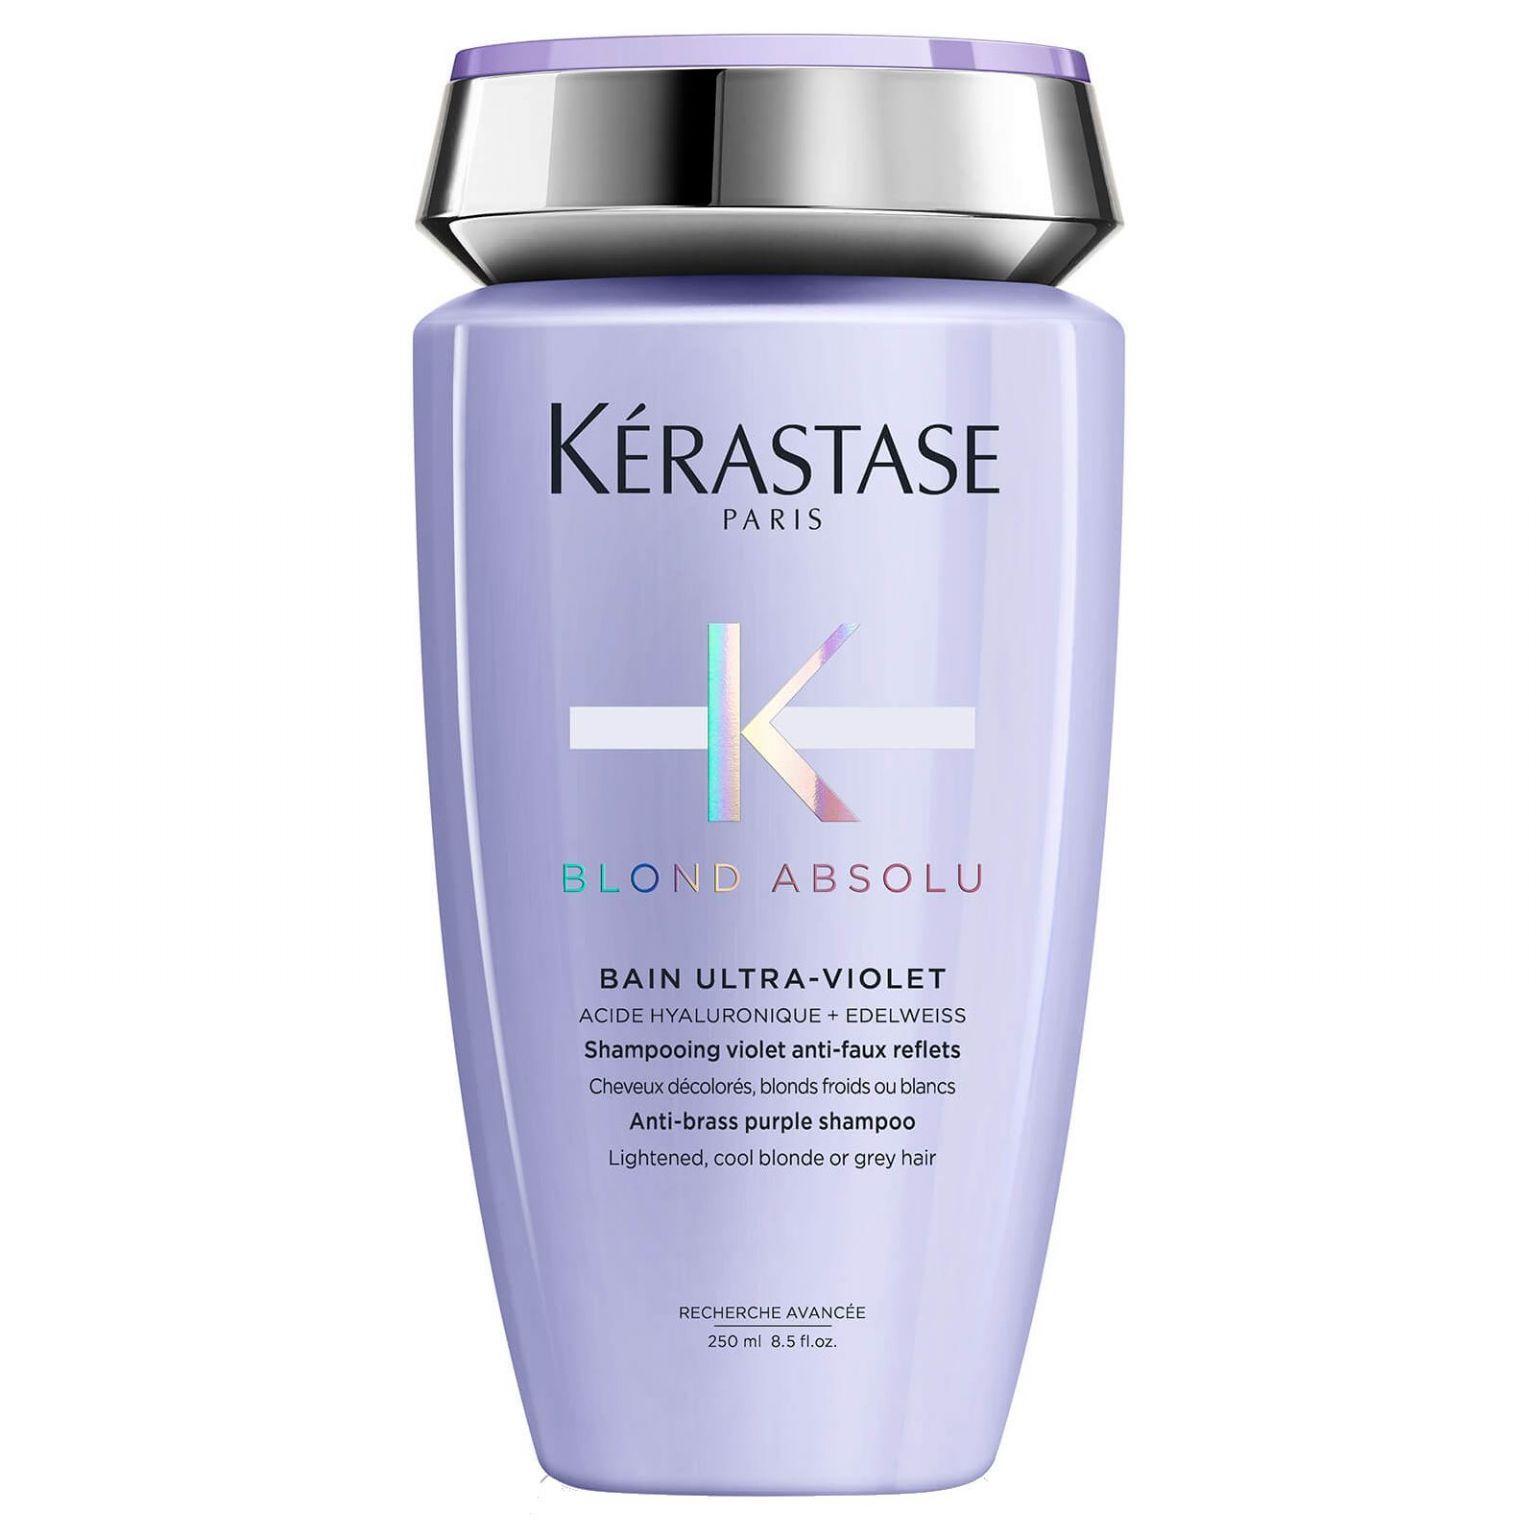 Blond Absolu Bain Ultra Violet Shampoo